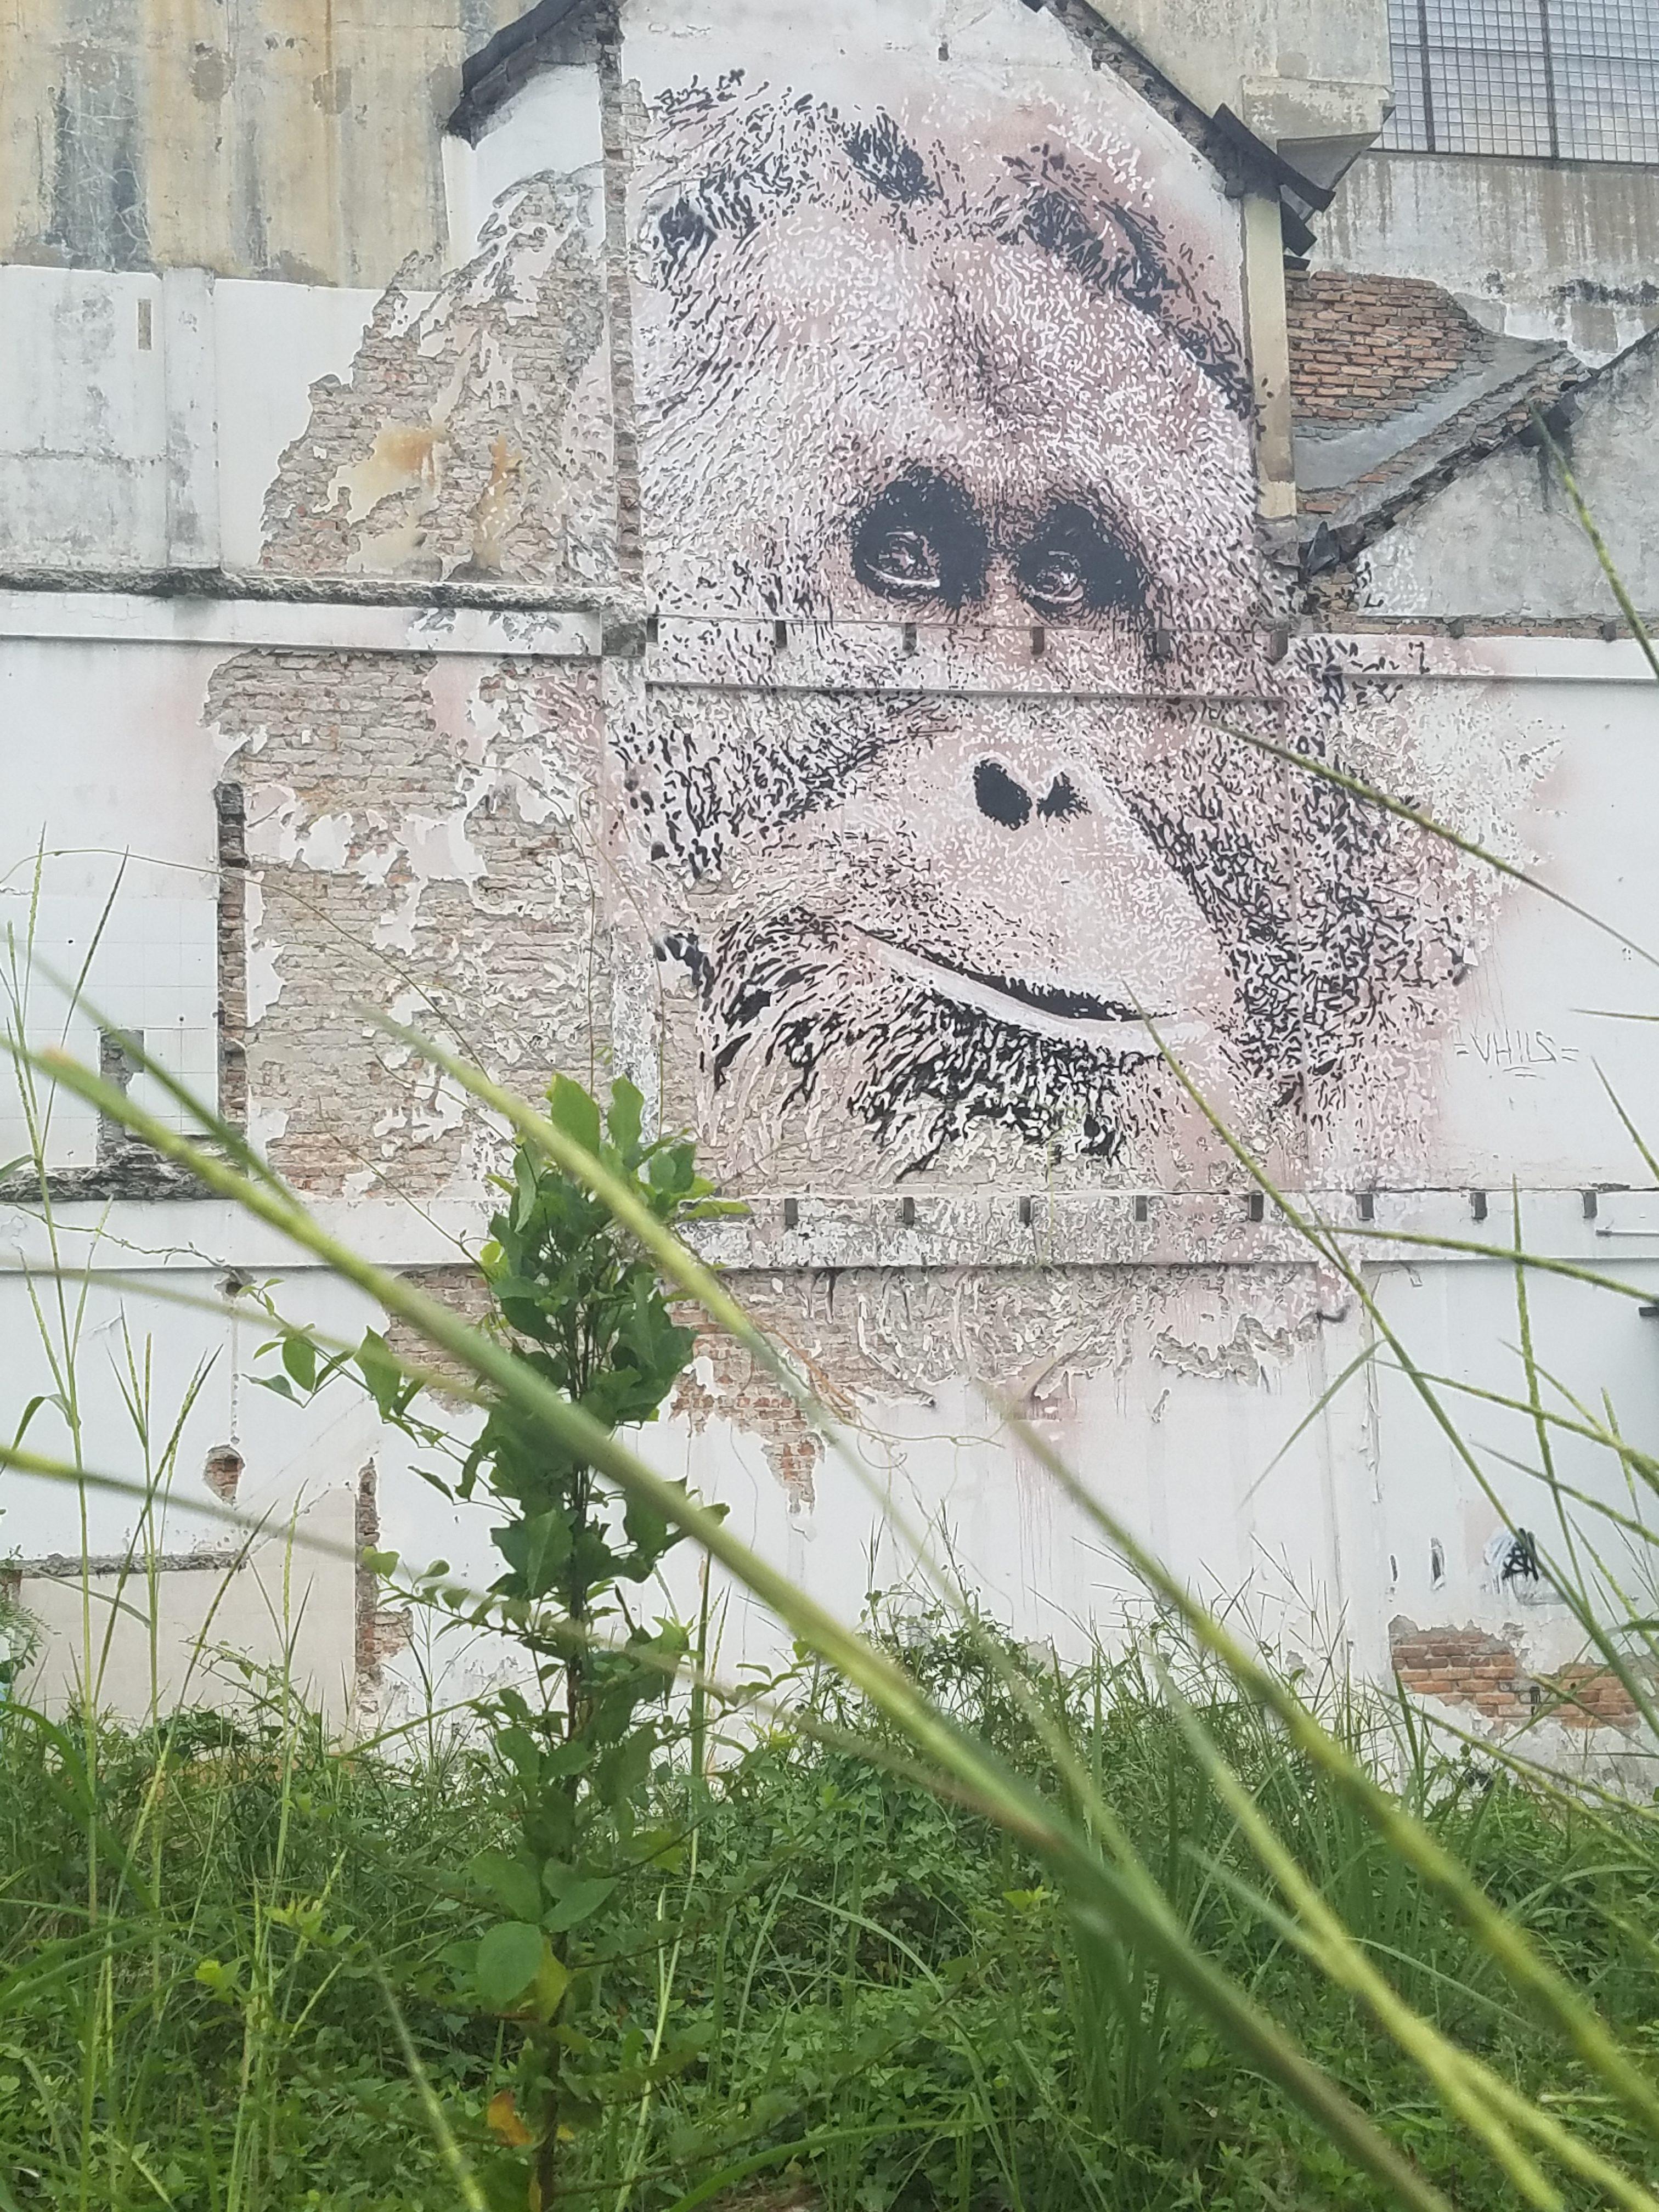 New Mural Art of Orangutan Stole Public Attention